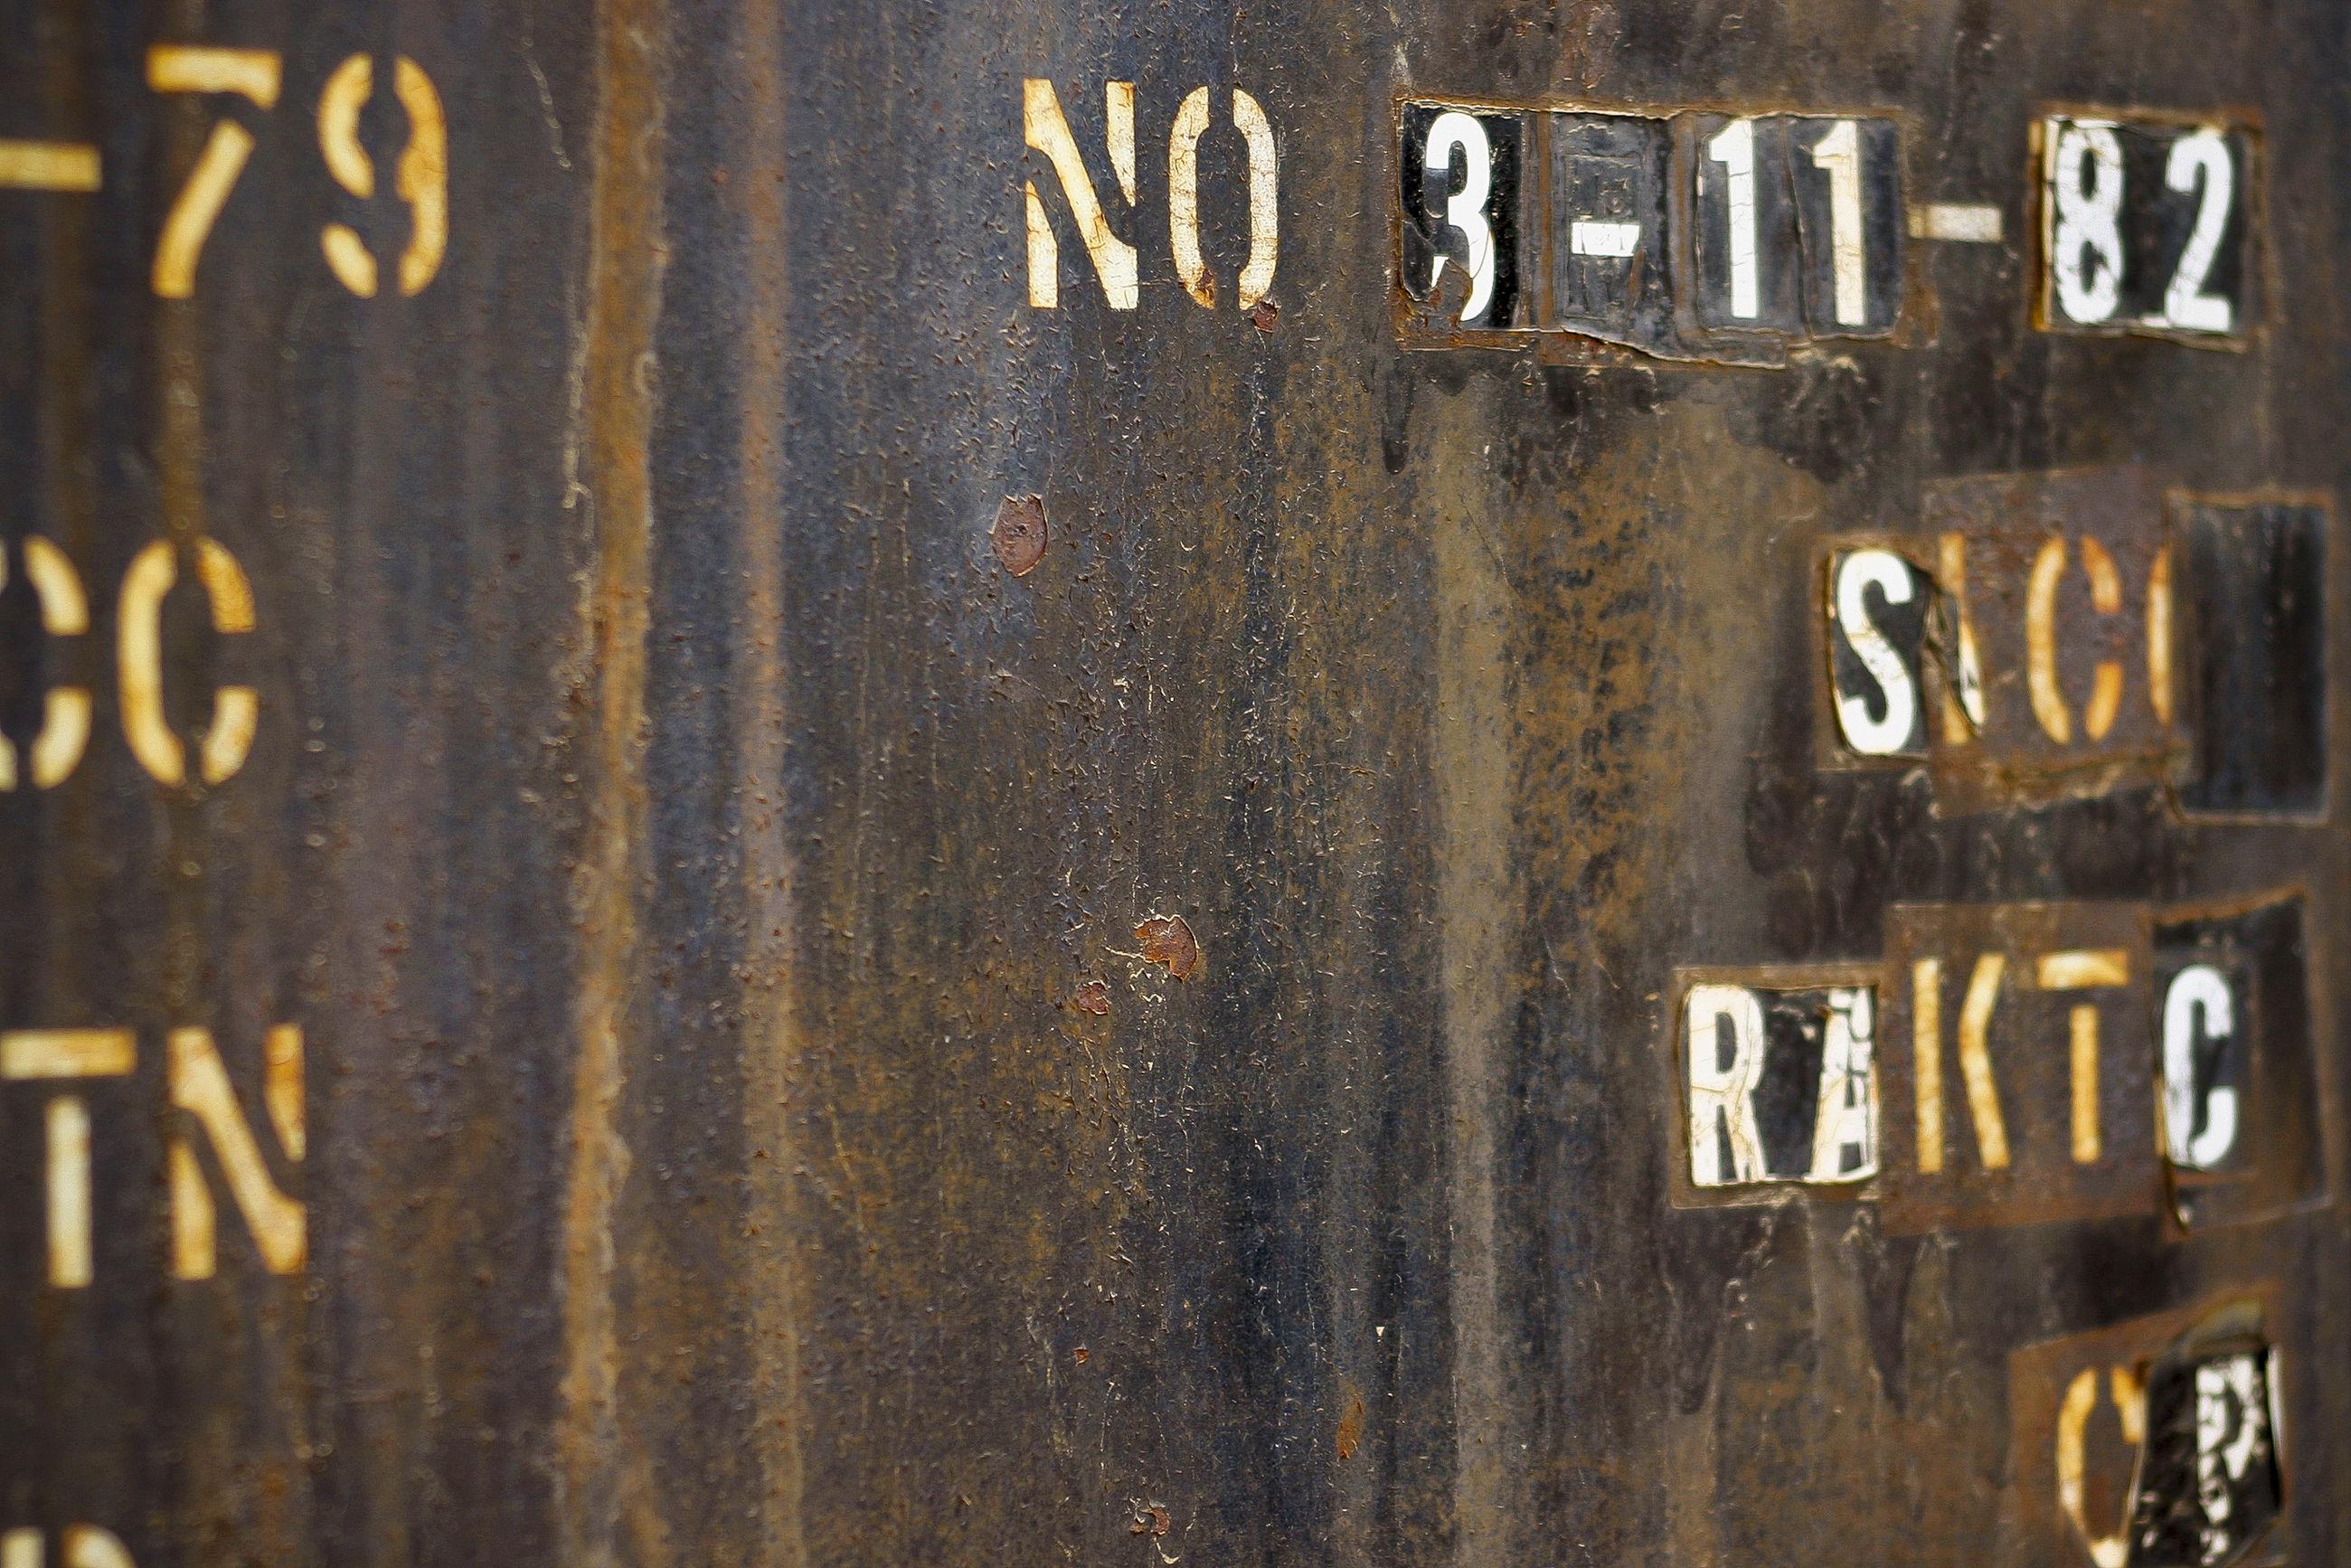 Text on old rusty metal board in train